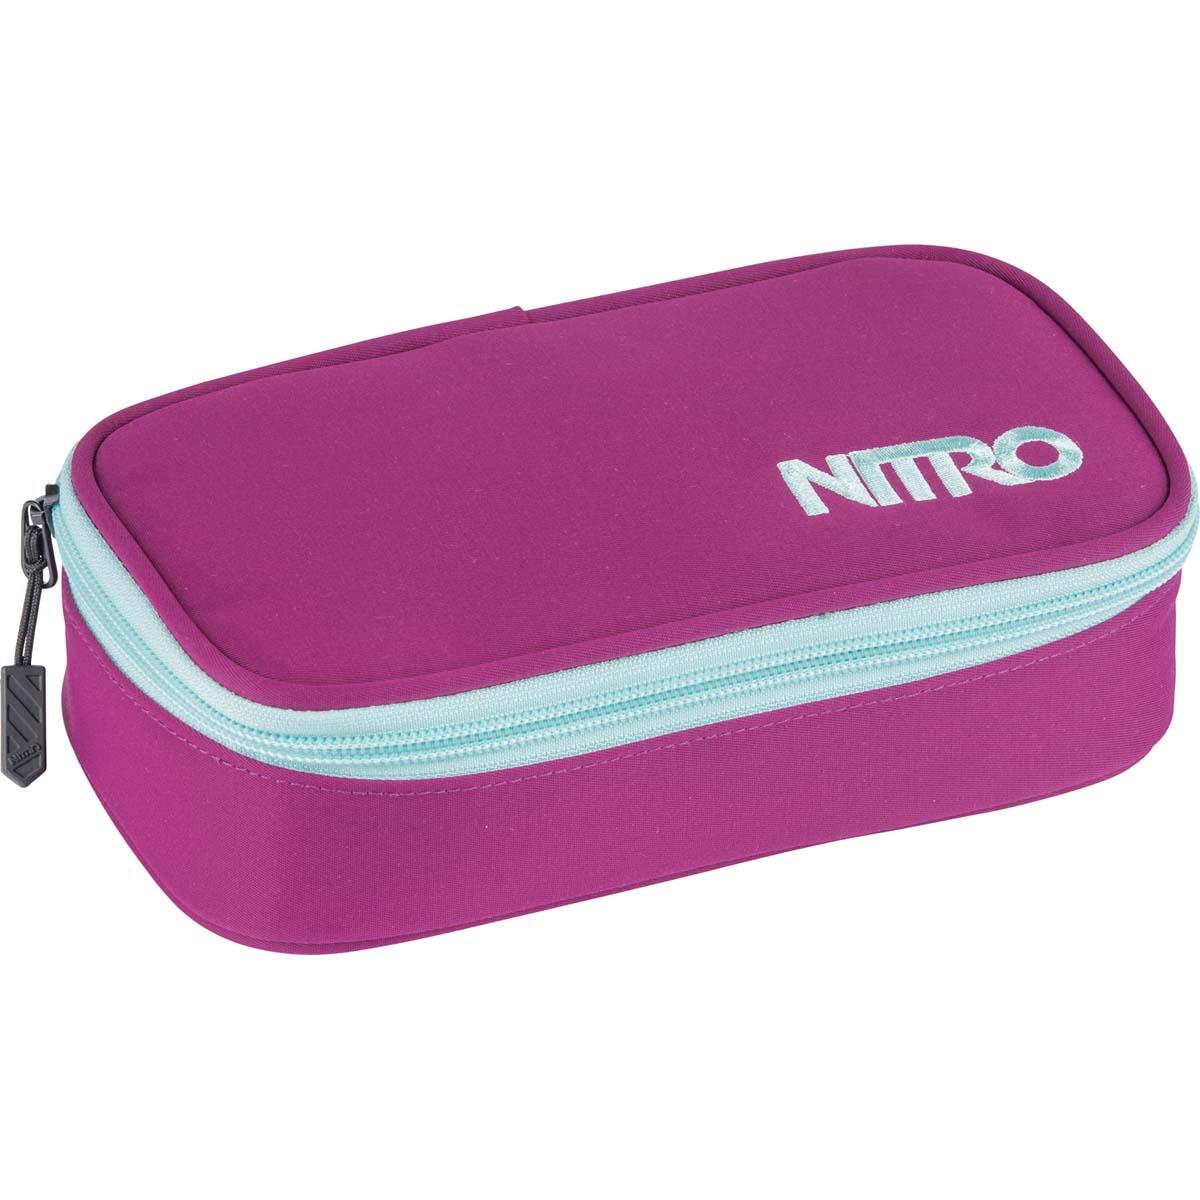 Nitro Pencil Case XL Grateful Pink